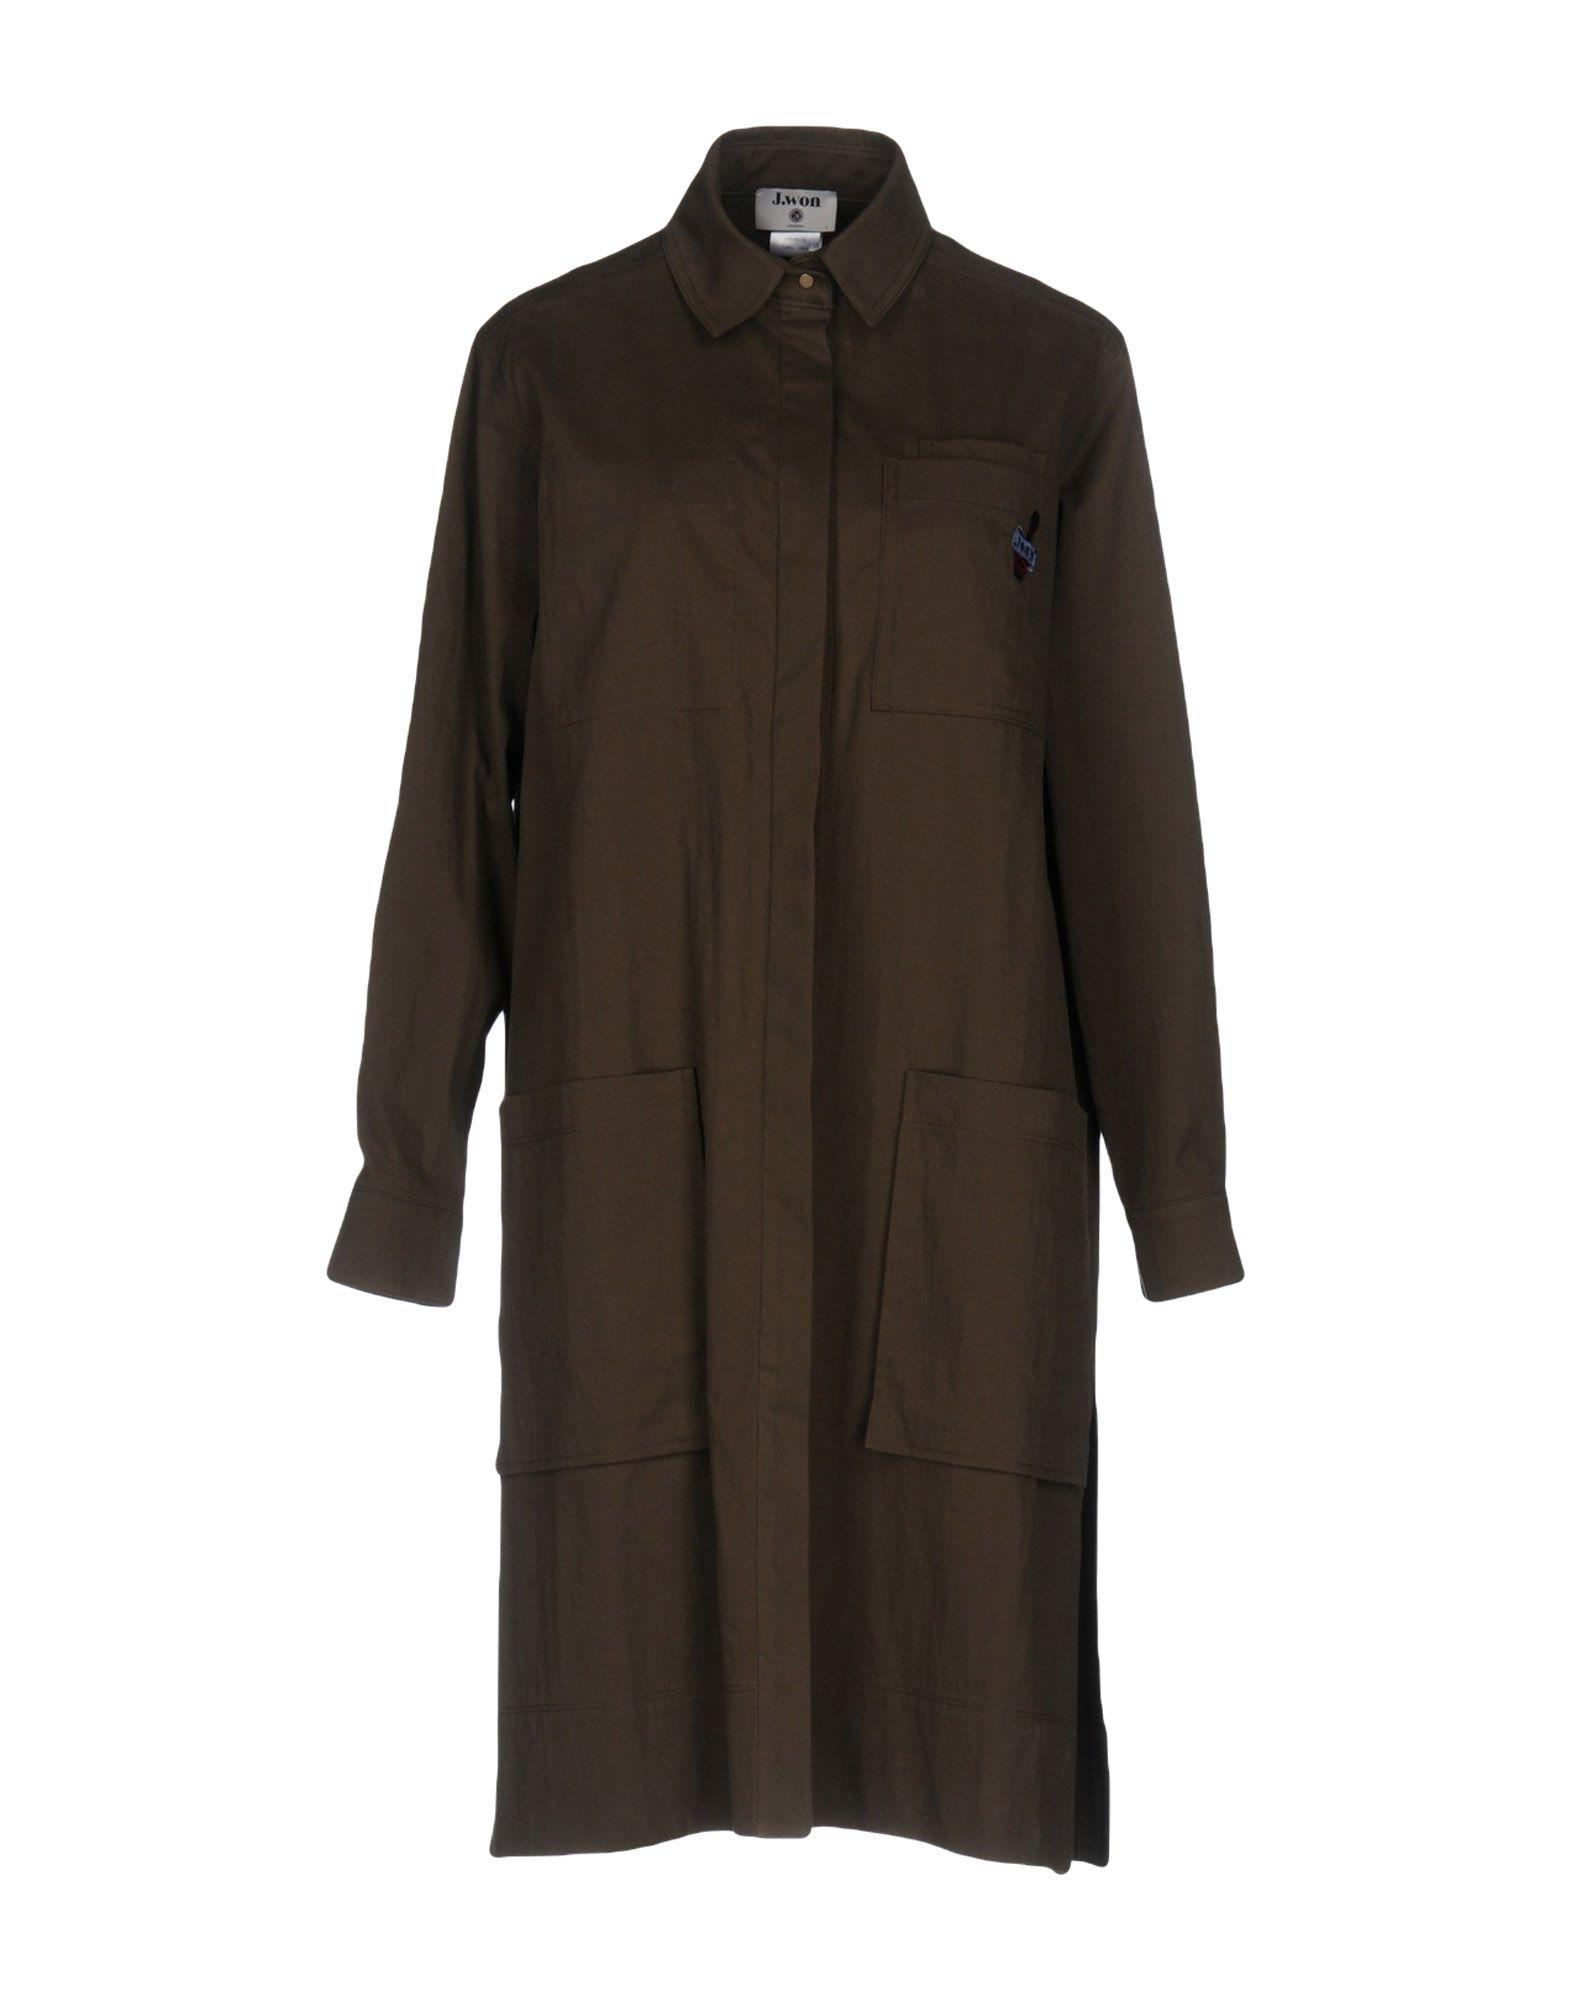 J.WON Full-Length Jacket in Military Green